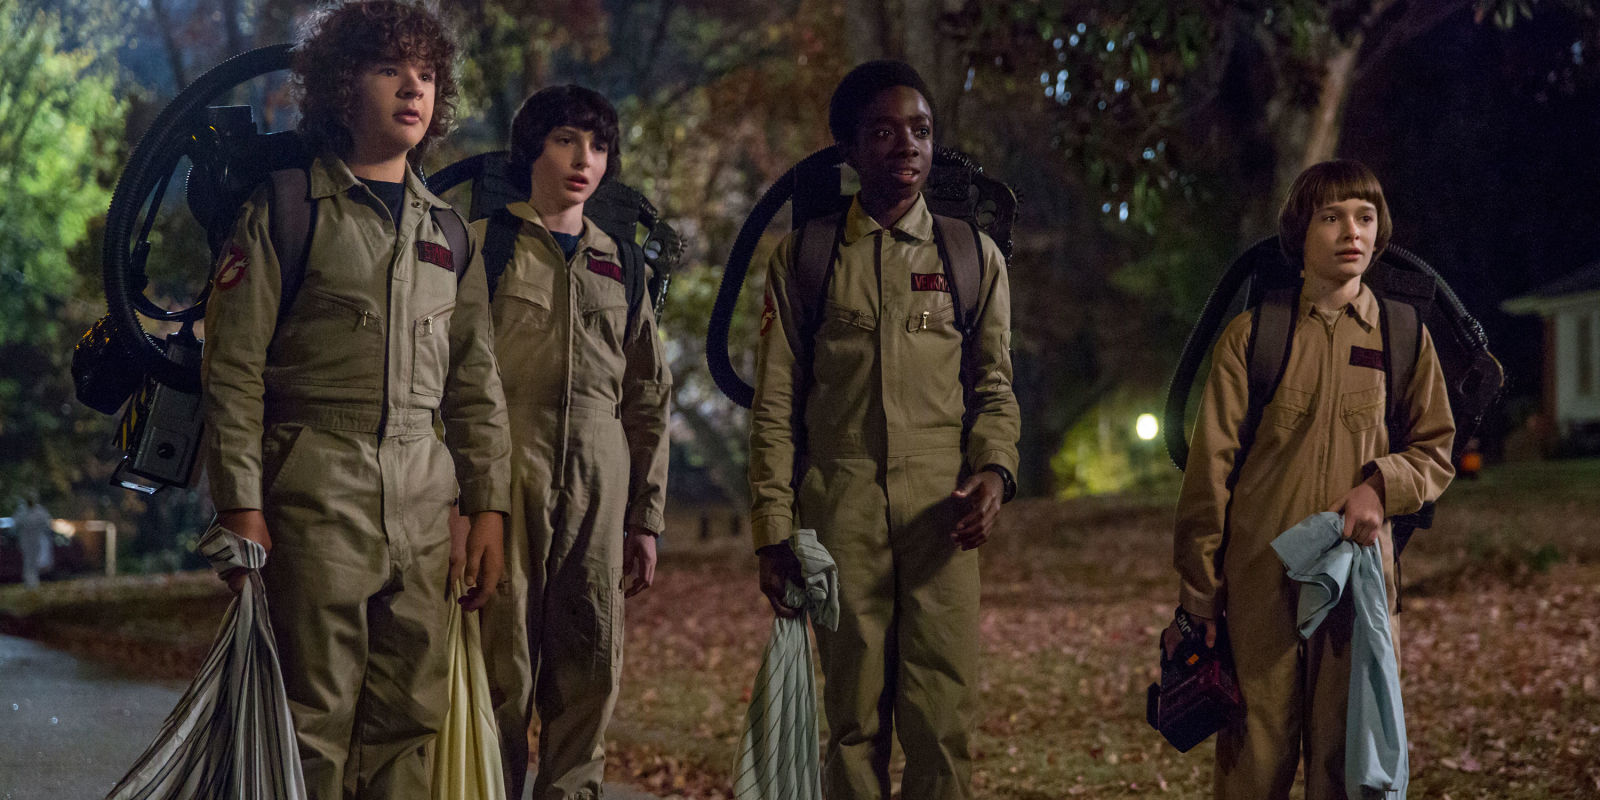 Revelan algunos detalles de la tercera temporada de Stranger Things